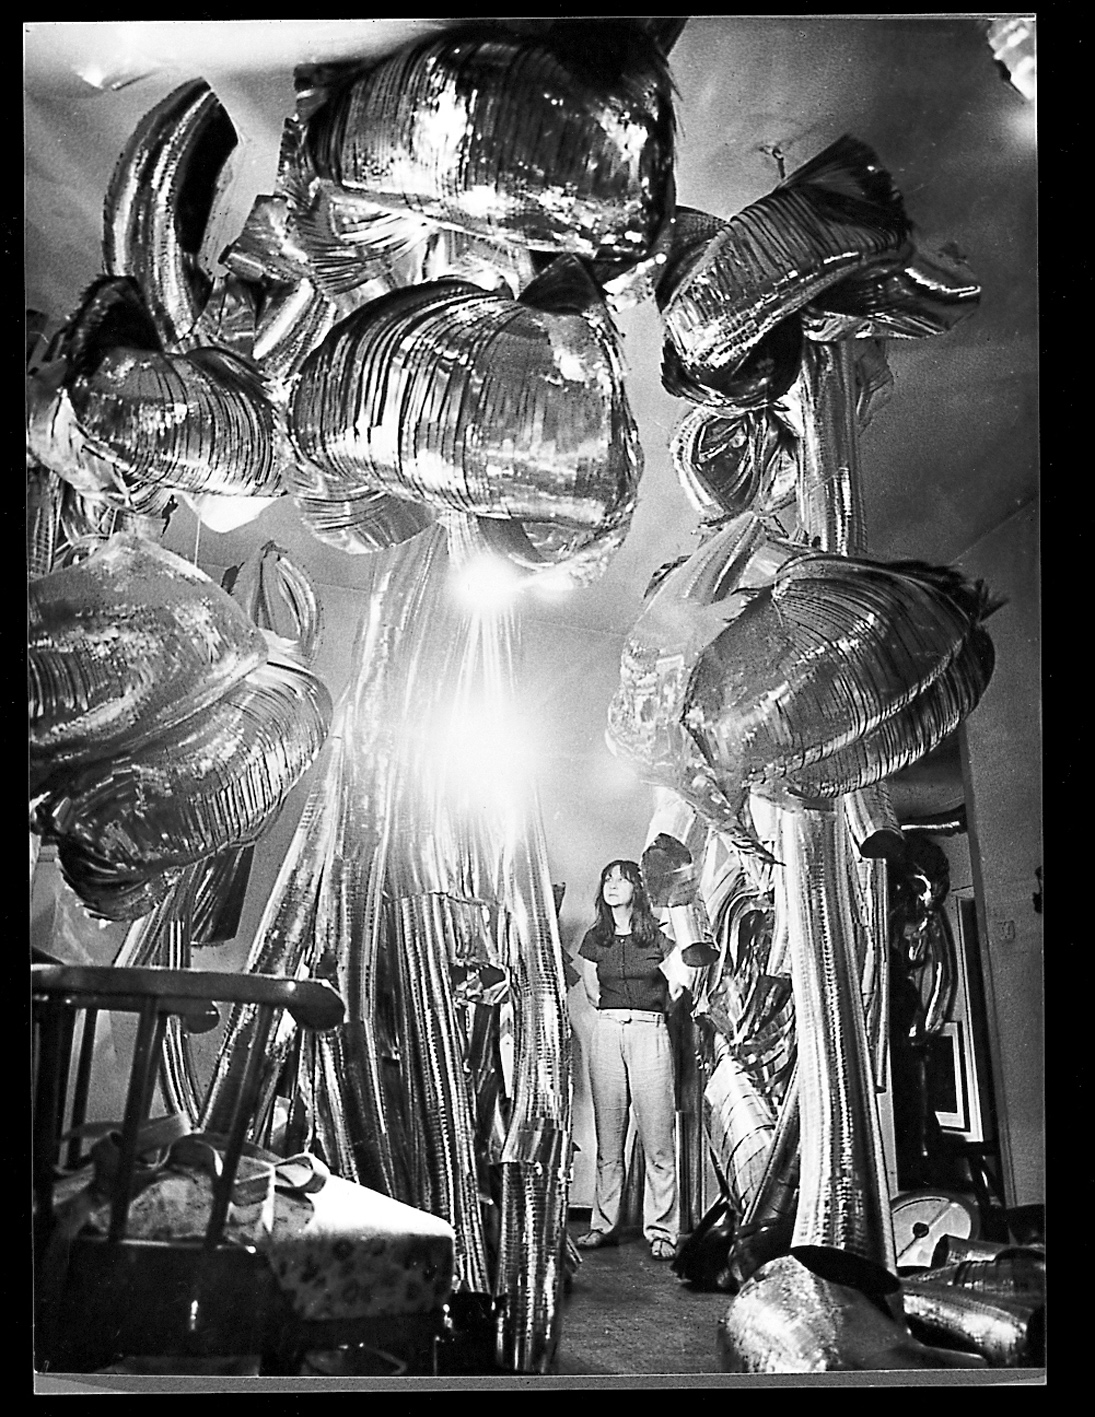 19.-Marisa-Merz-with-Living-Sculpture-Turin-1966.jpg